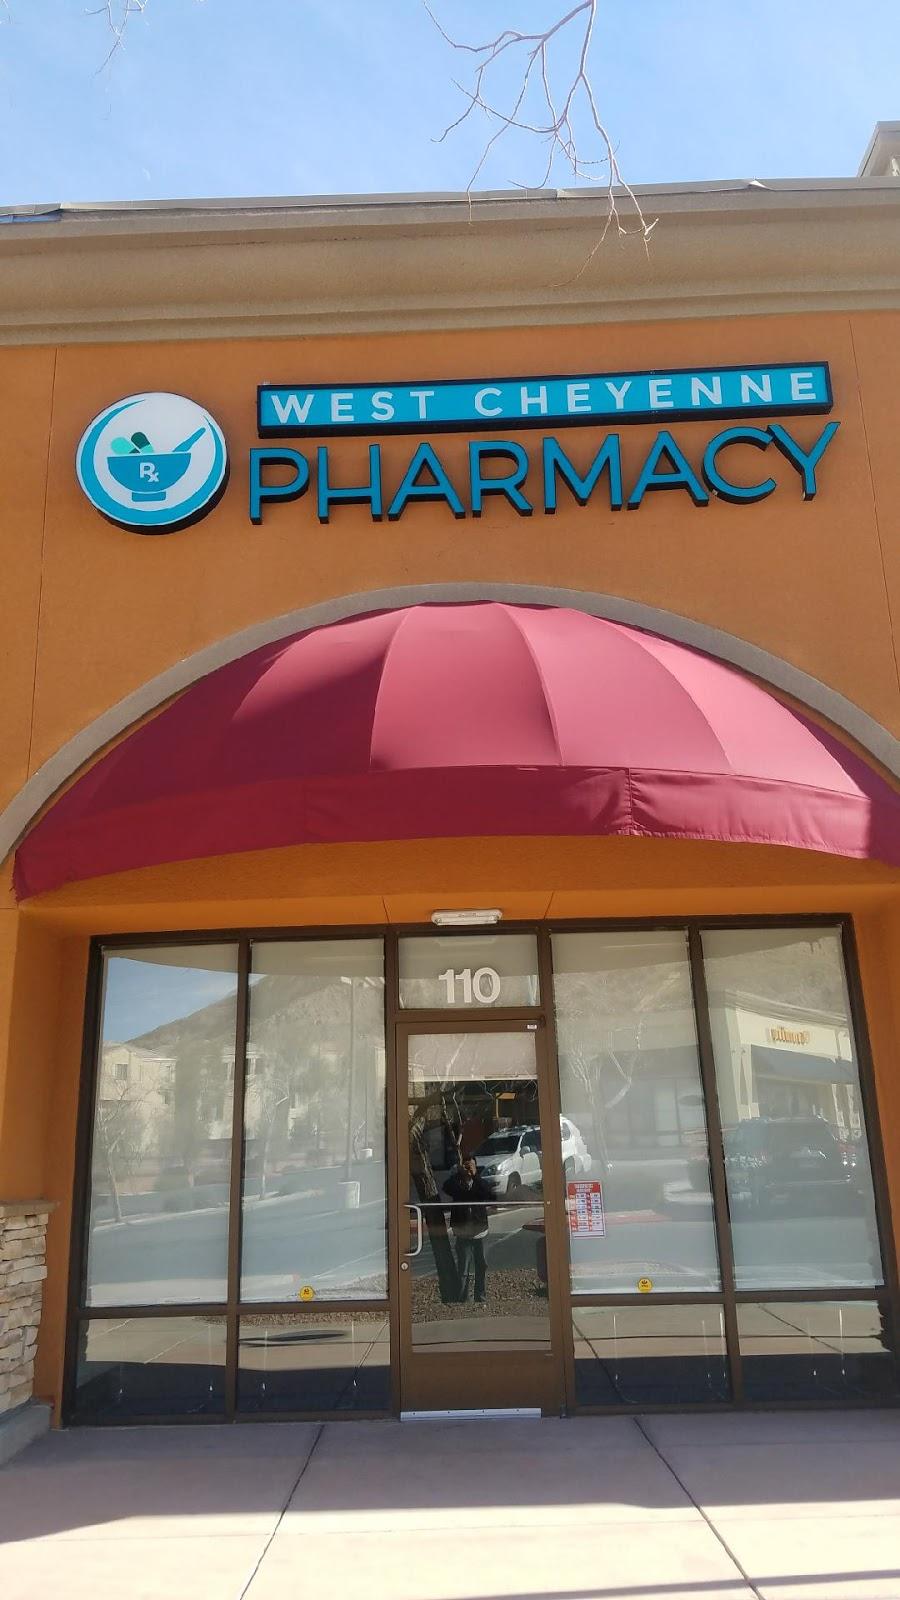 West Cheyenne Pharmacy - pharmacy    Photo 7 of 8   Address: 3350 Novat St suite 110, Las Vegas, NV 89129, USA   Phone: (702) 395-3004